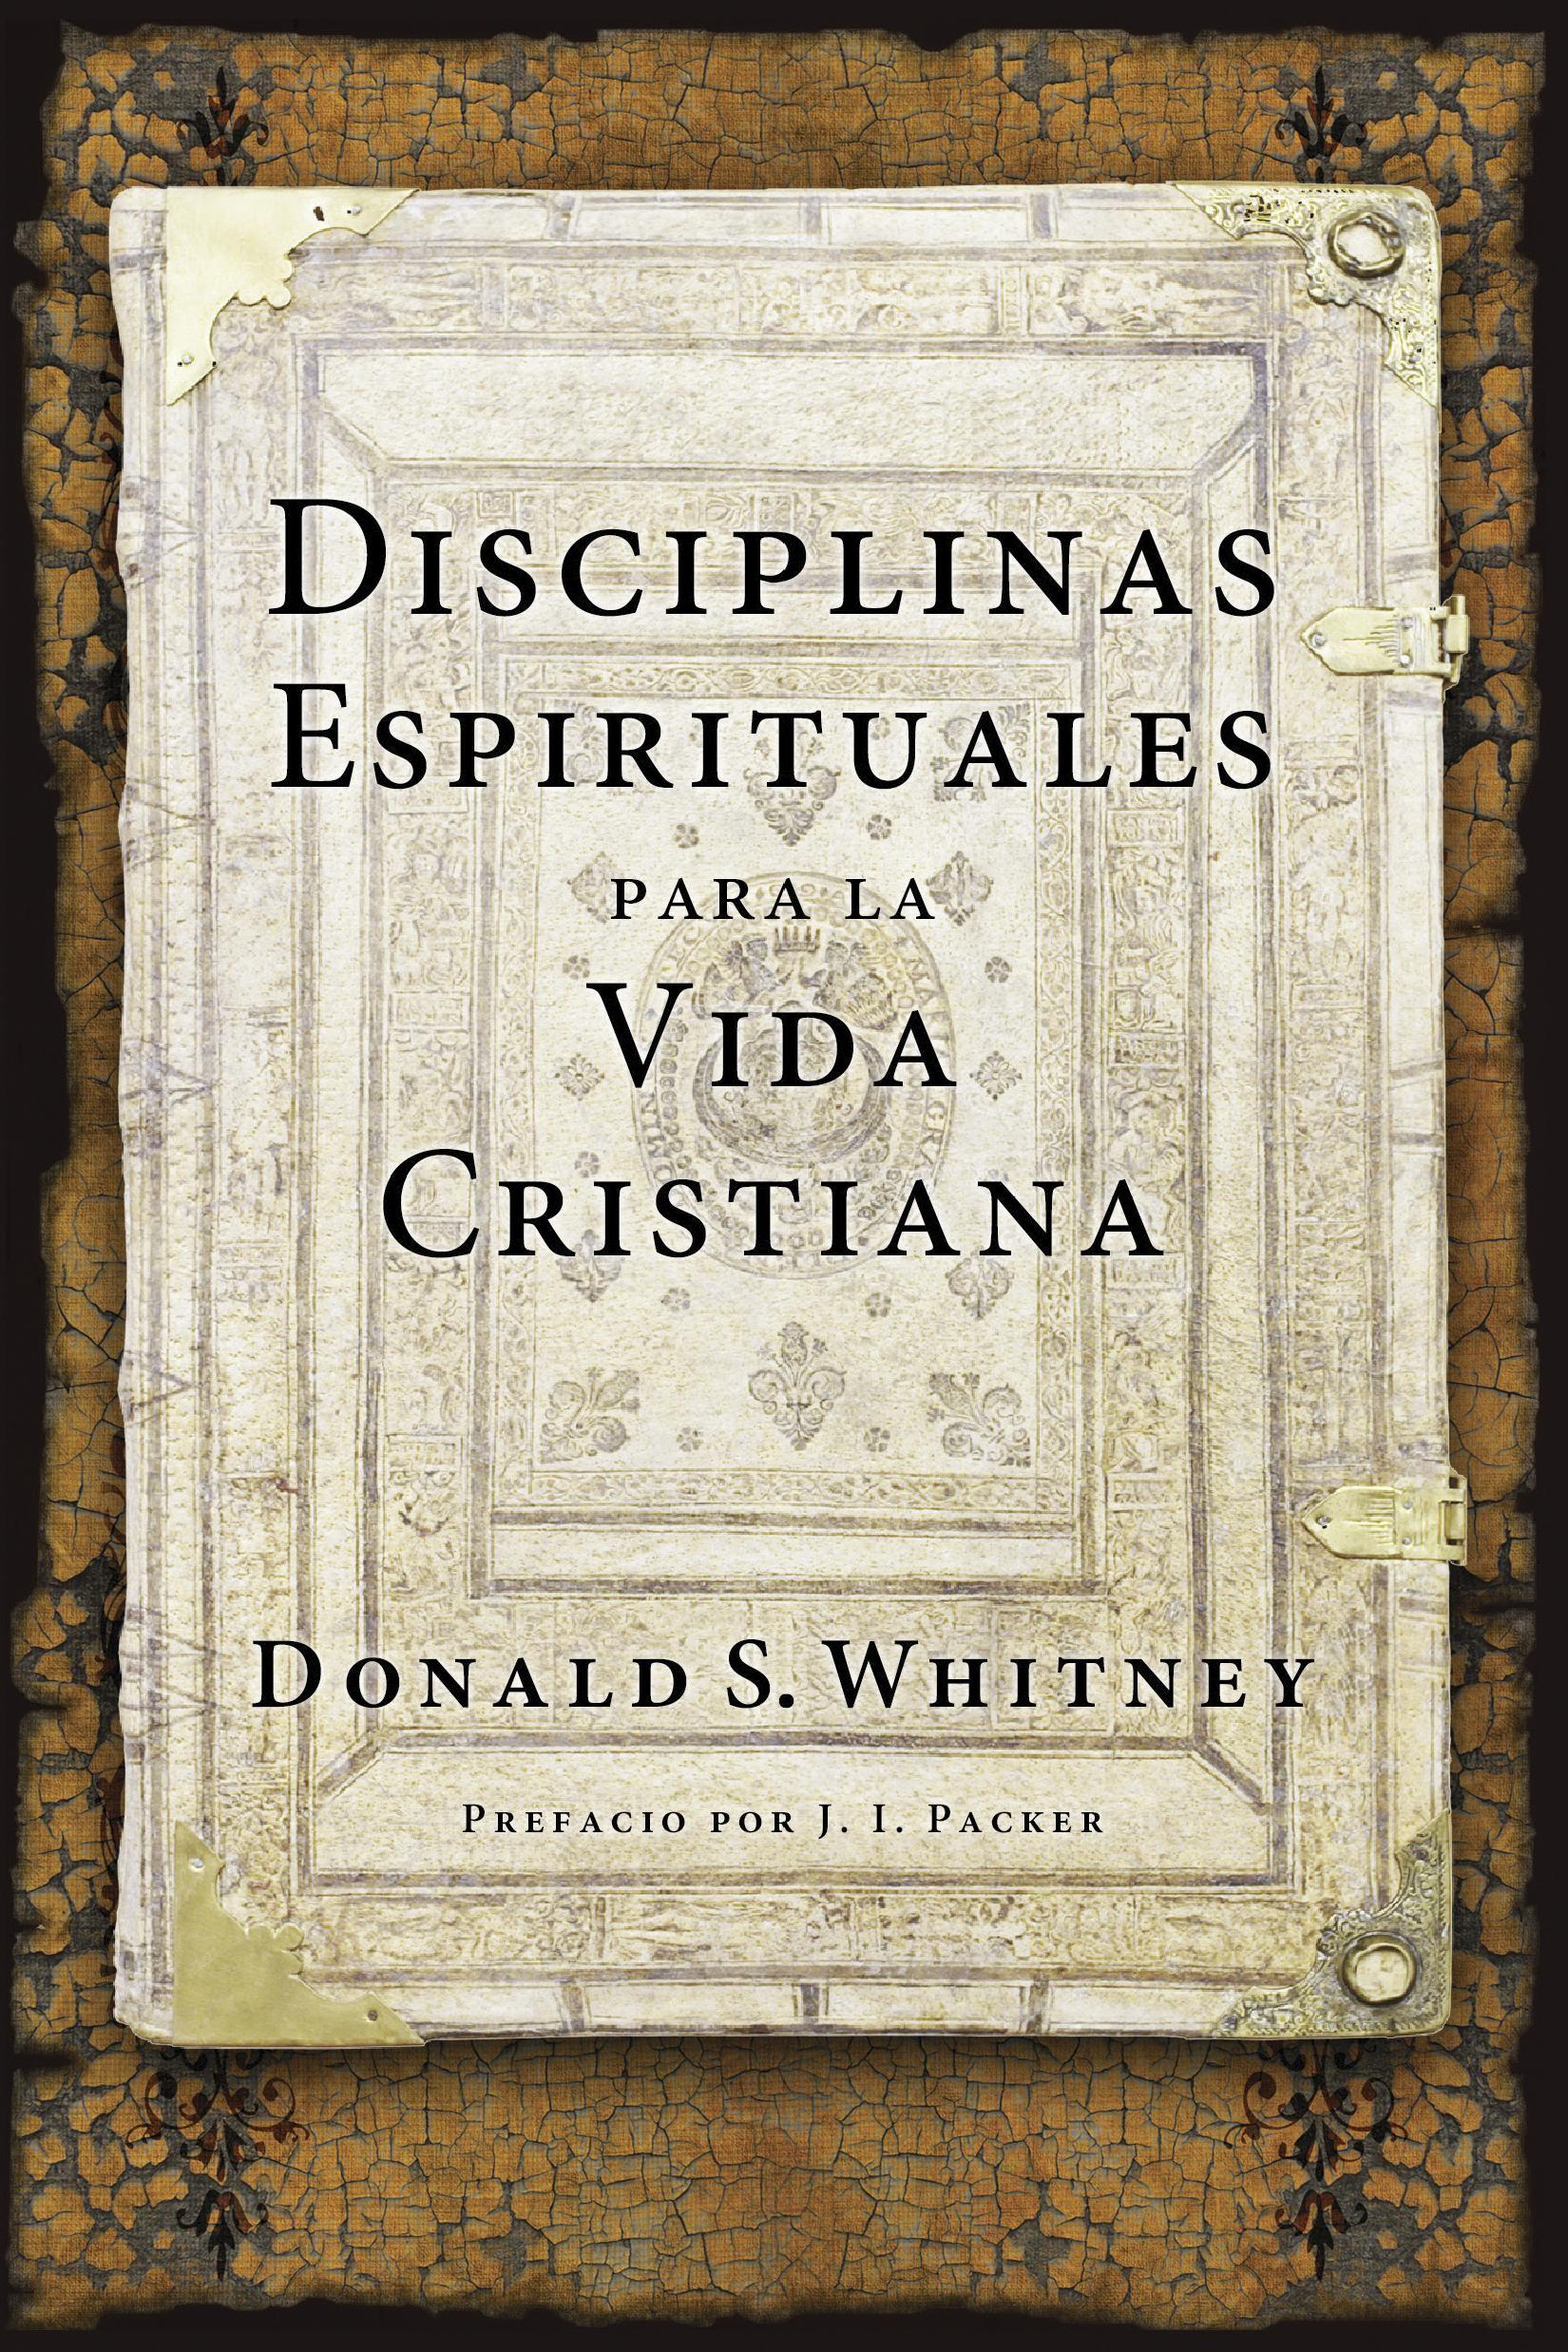 Disciplinas espirituales para la vida cristiana: Spiritual Disciplines for the Christian Life